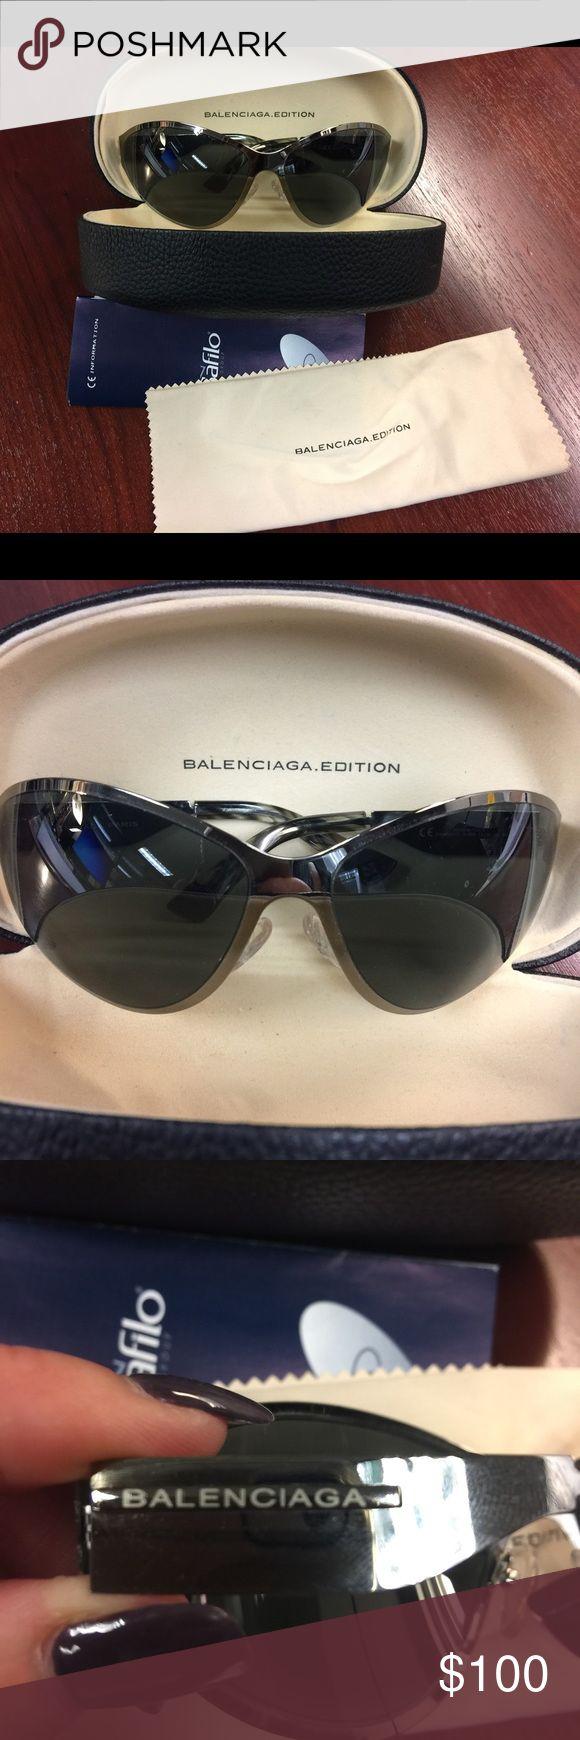 Balenciaga Sunglasses Like new condition! Light weight! Great sunglasses!!! Balenciaga Accessories Sunglasses